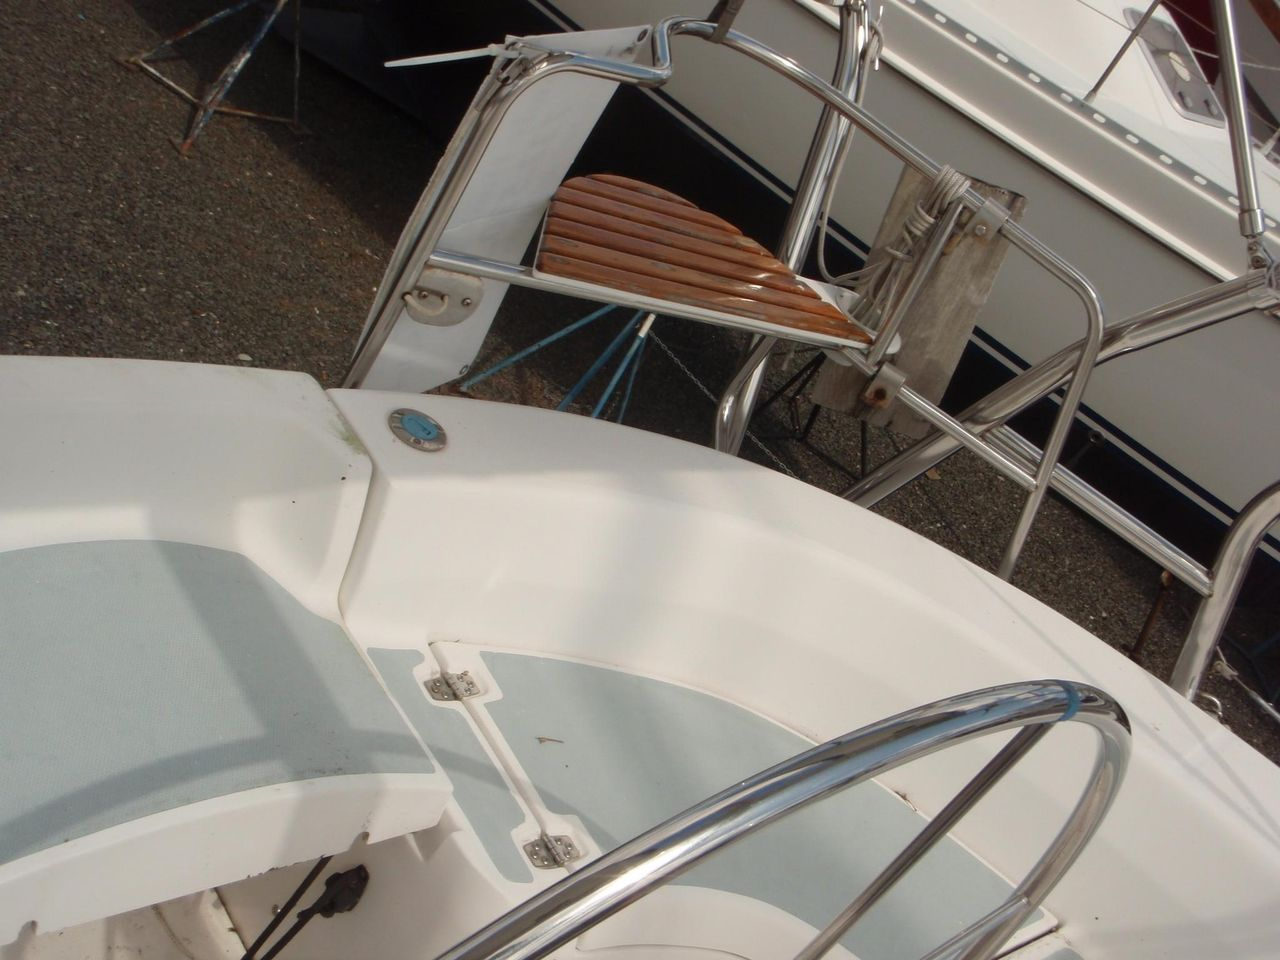 2002 Used Hunter 410 Sloop Sailboat For Sale - $89,900